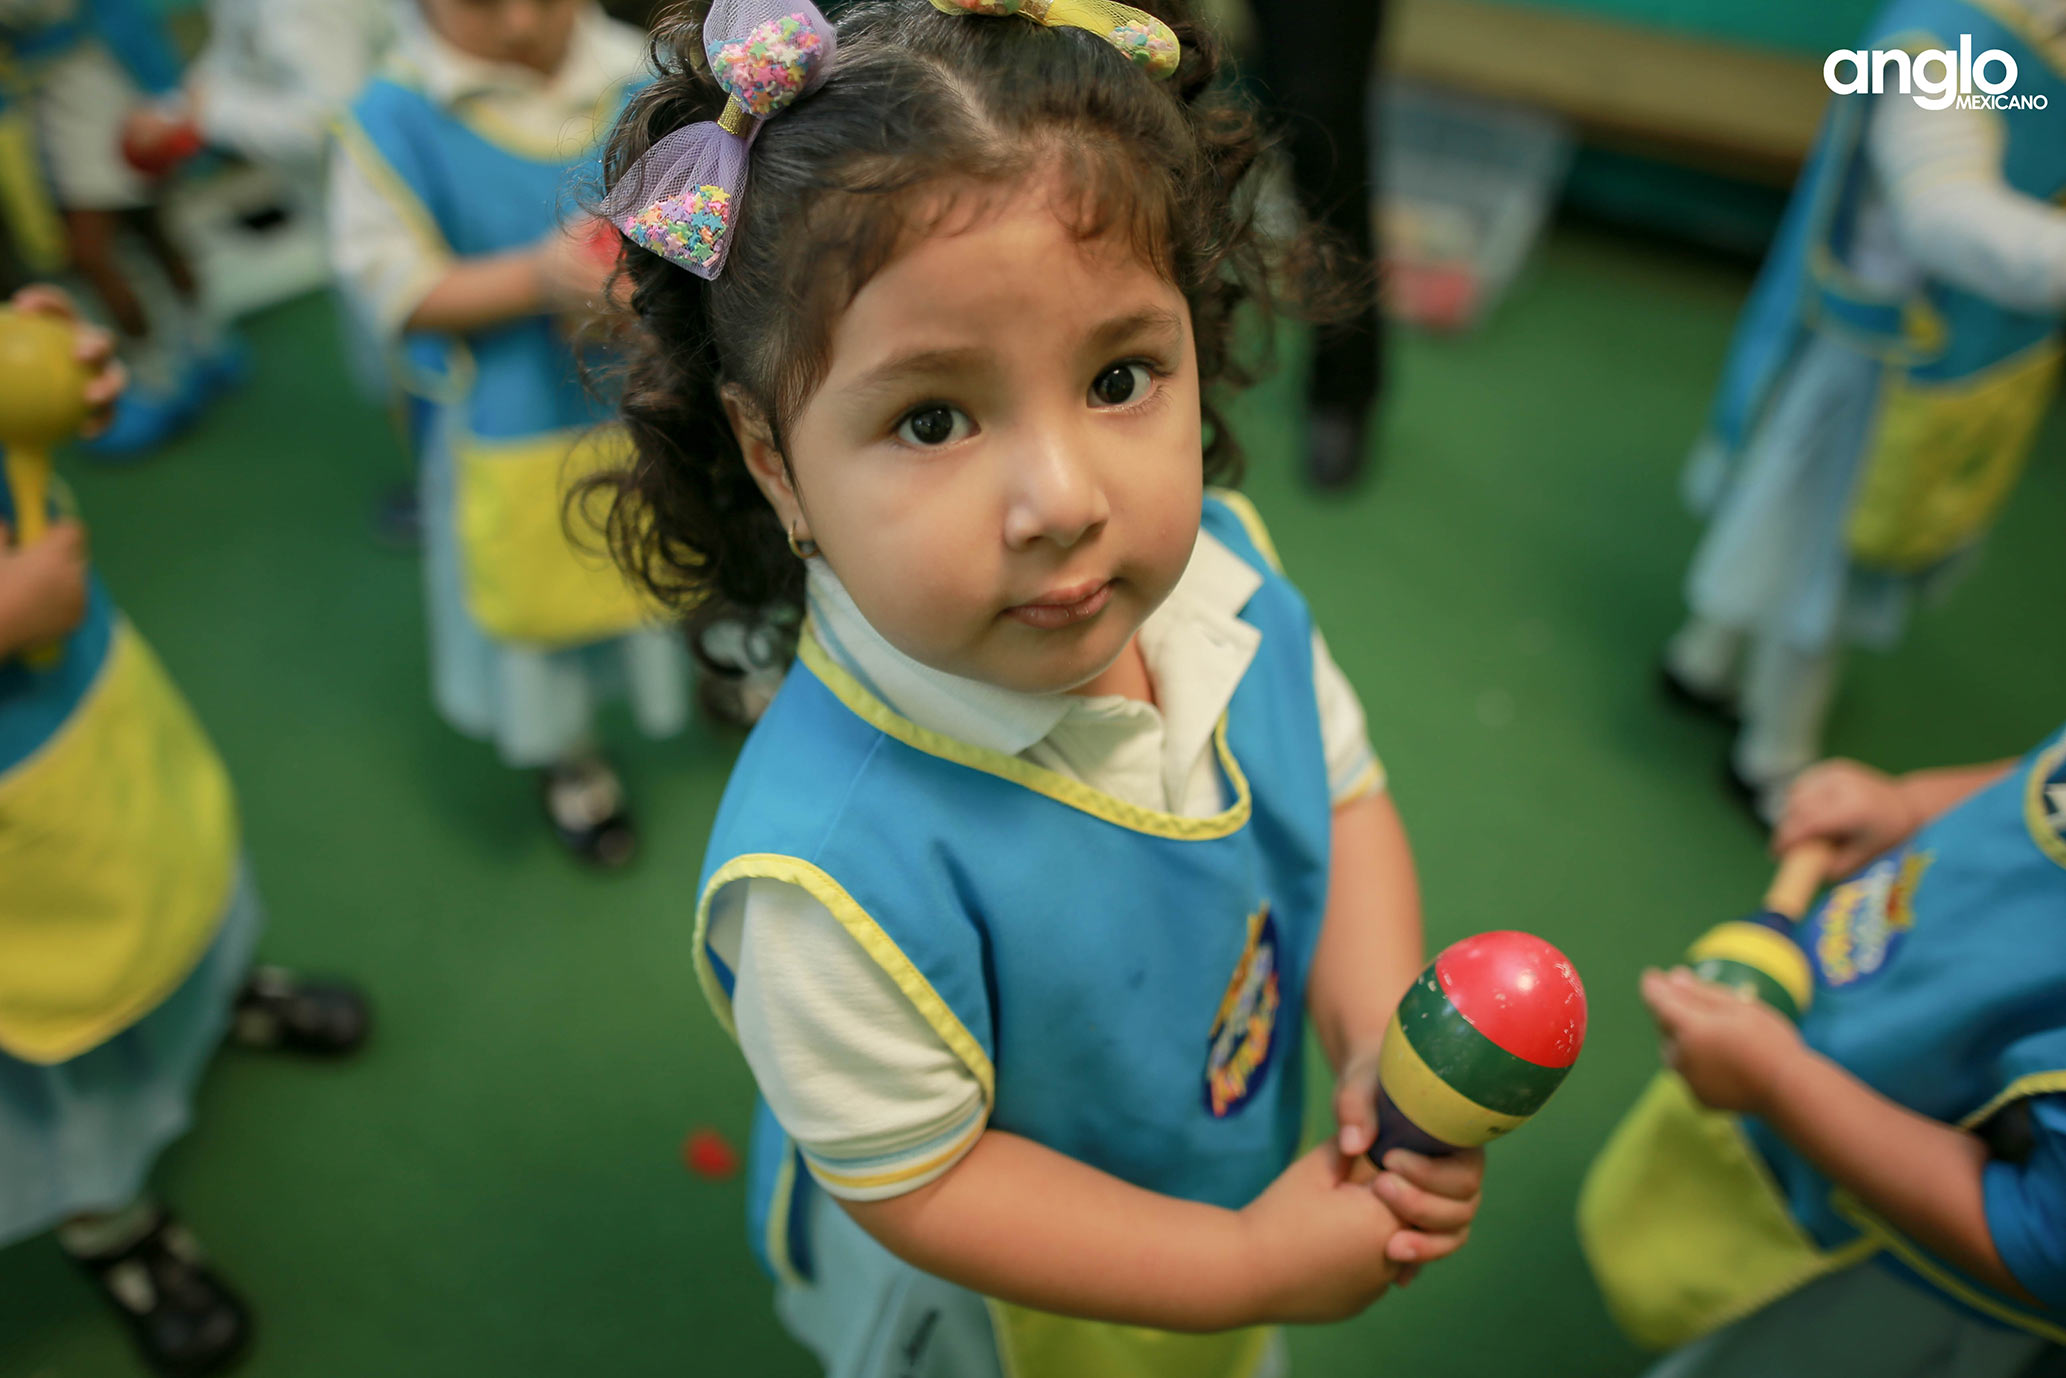 cai---cendi---maternal---colegio-anglo-mexicano-de-coatzacoalcos-8